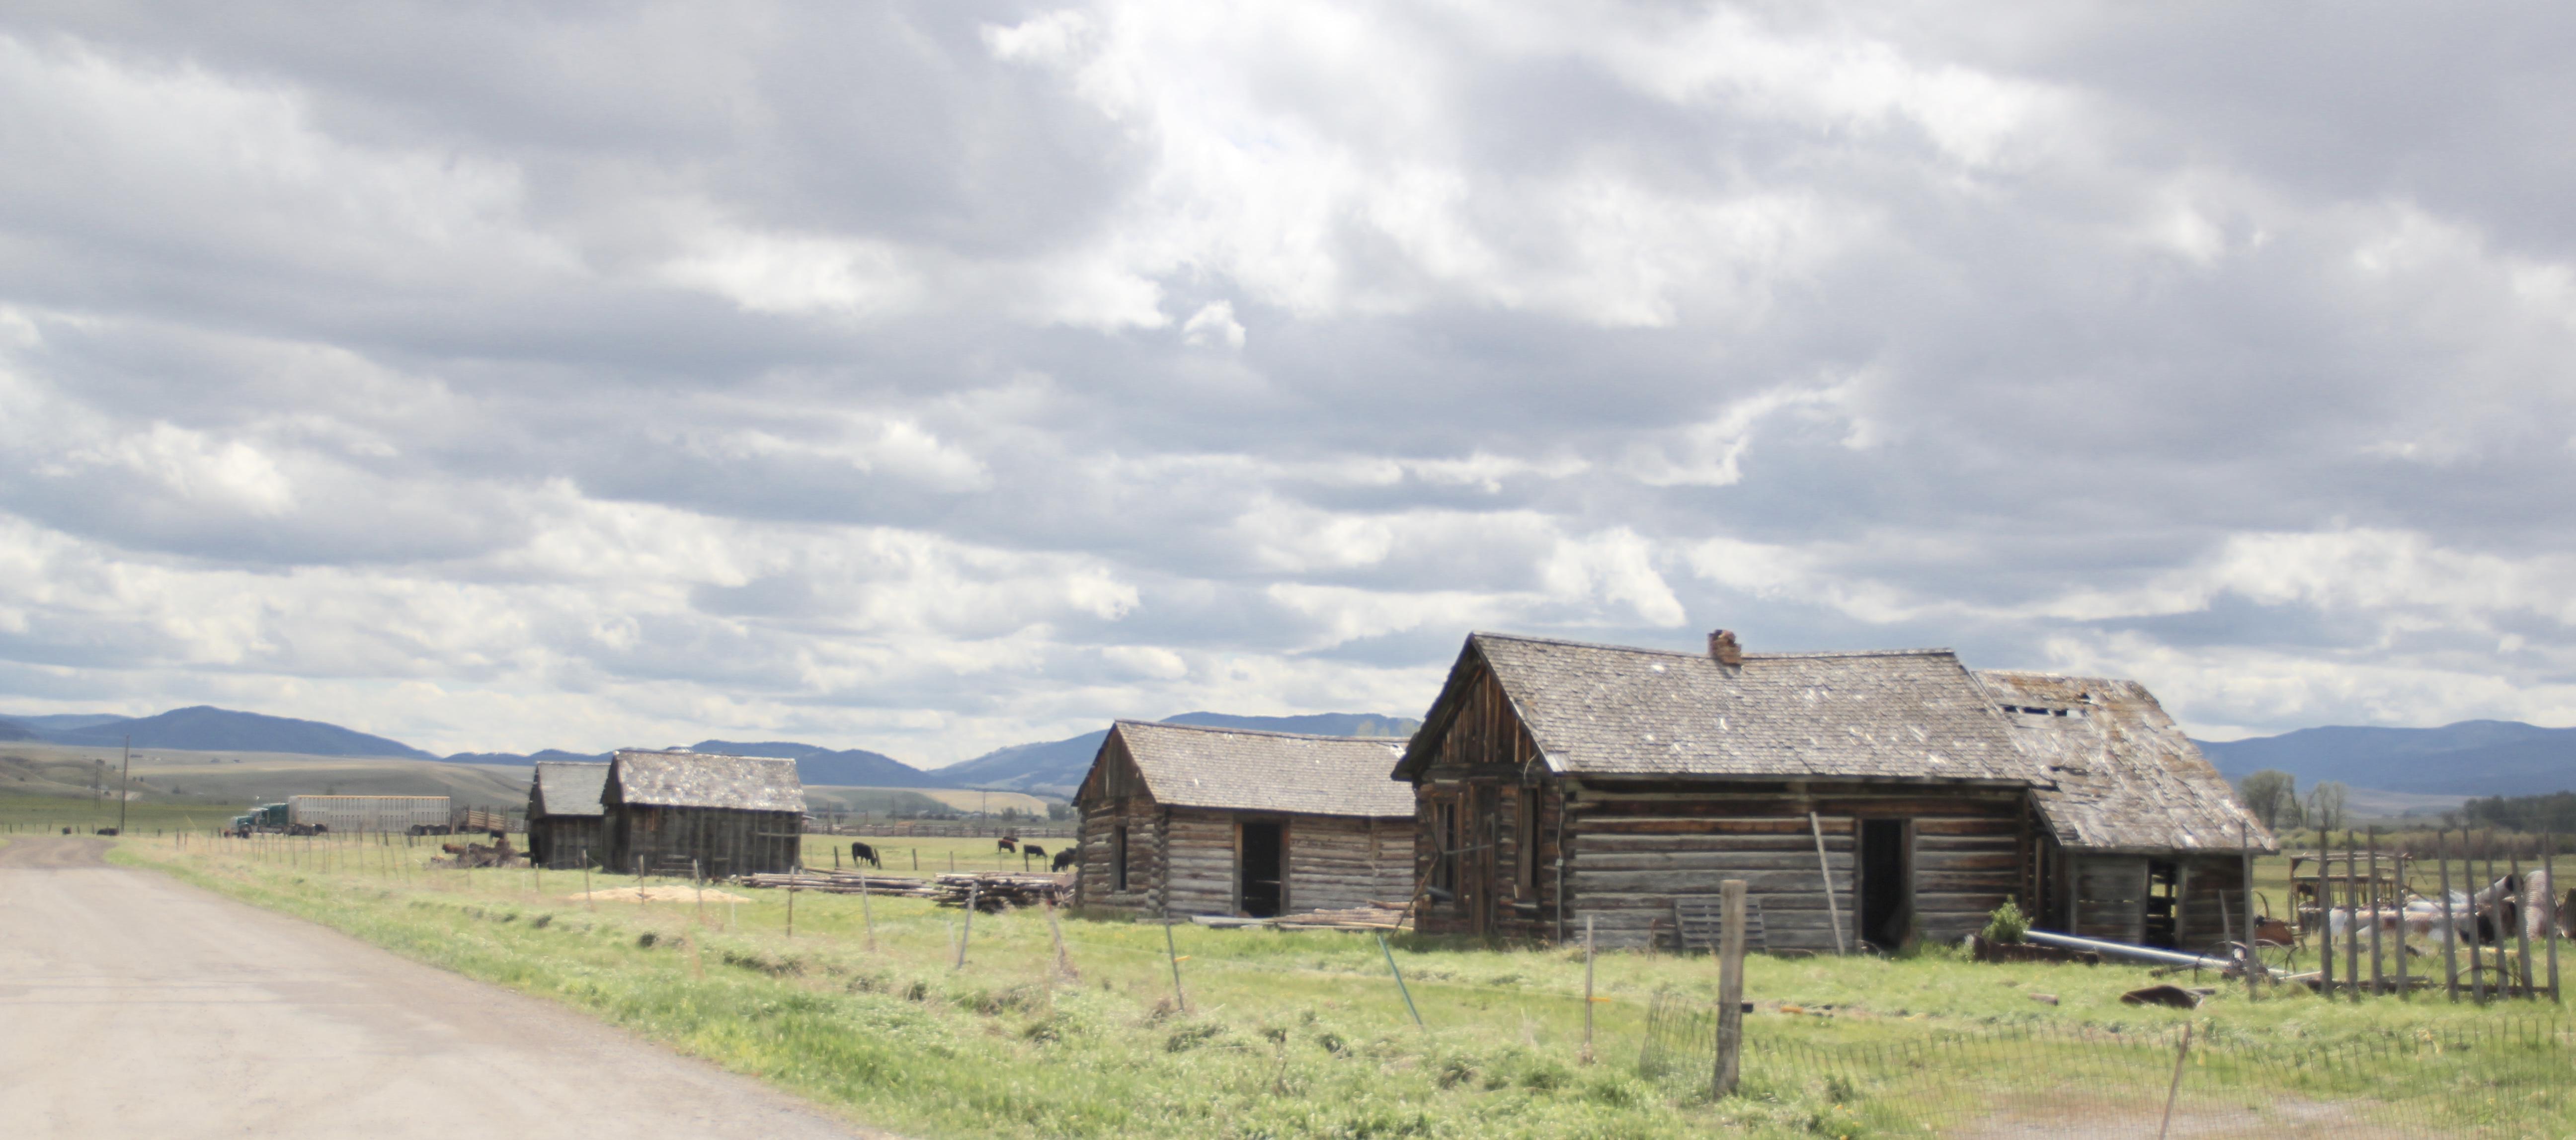 Log buildings at ranch off Mullan Road, s of Drummond, Granite Co